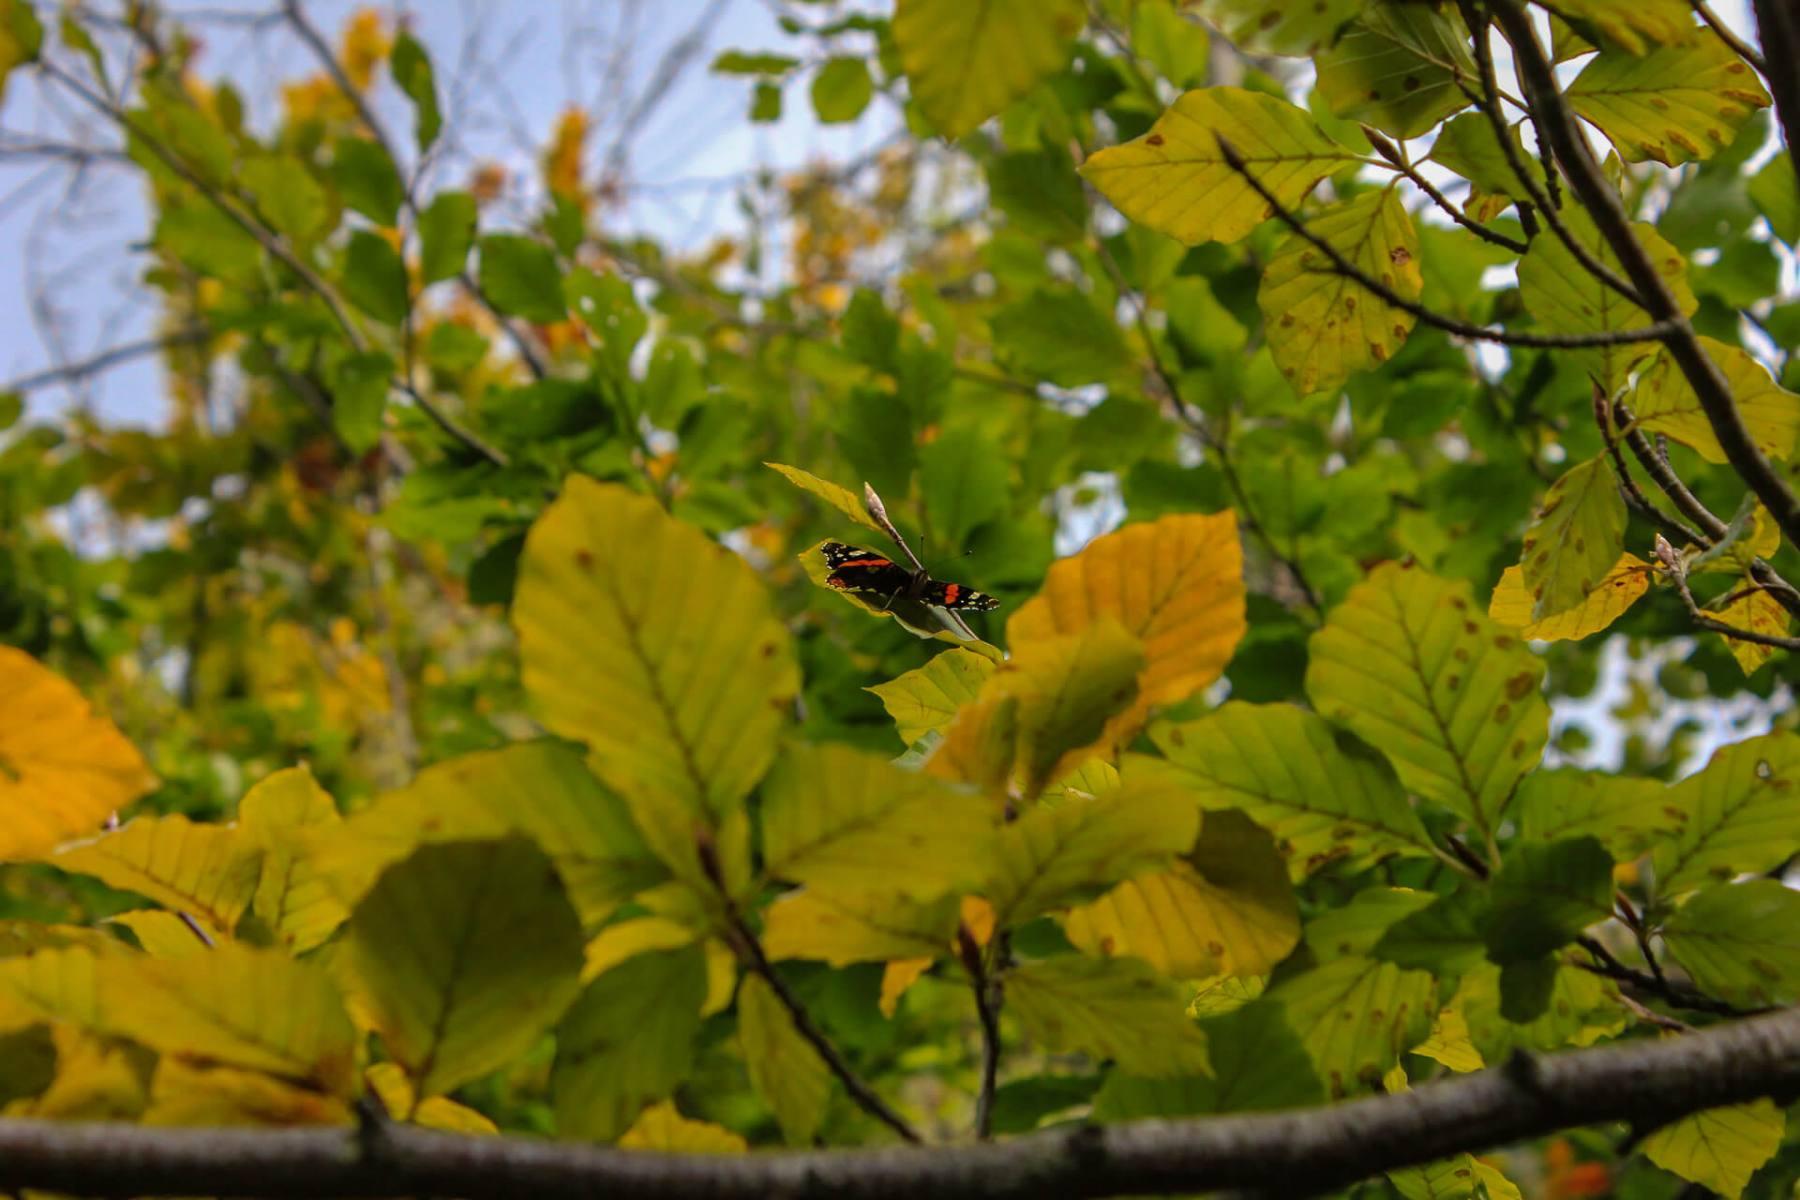 butterfly-closeup-symonds-yat-walk